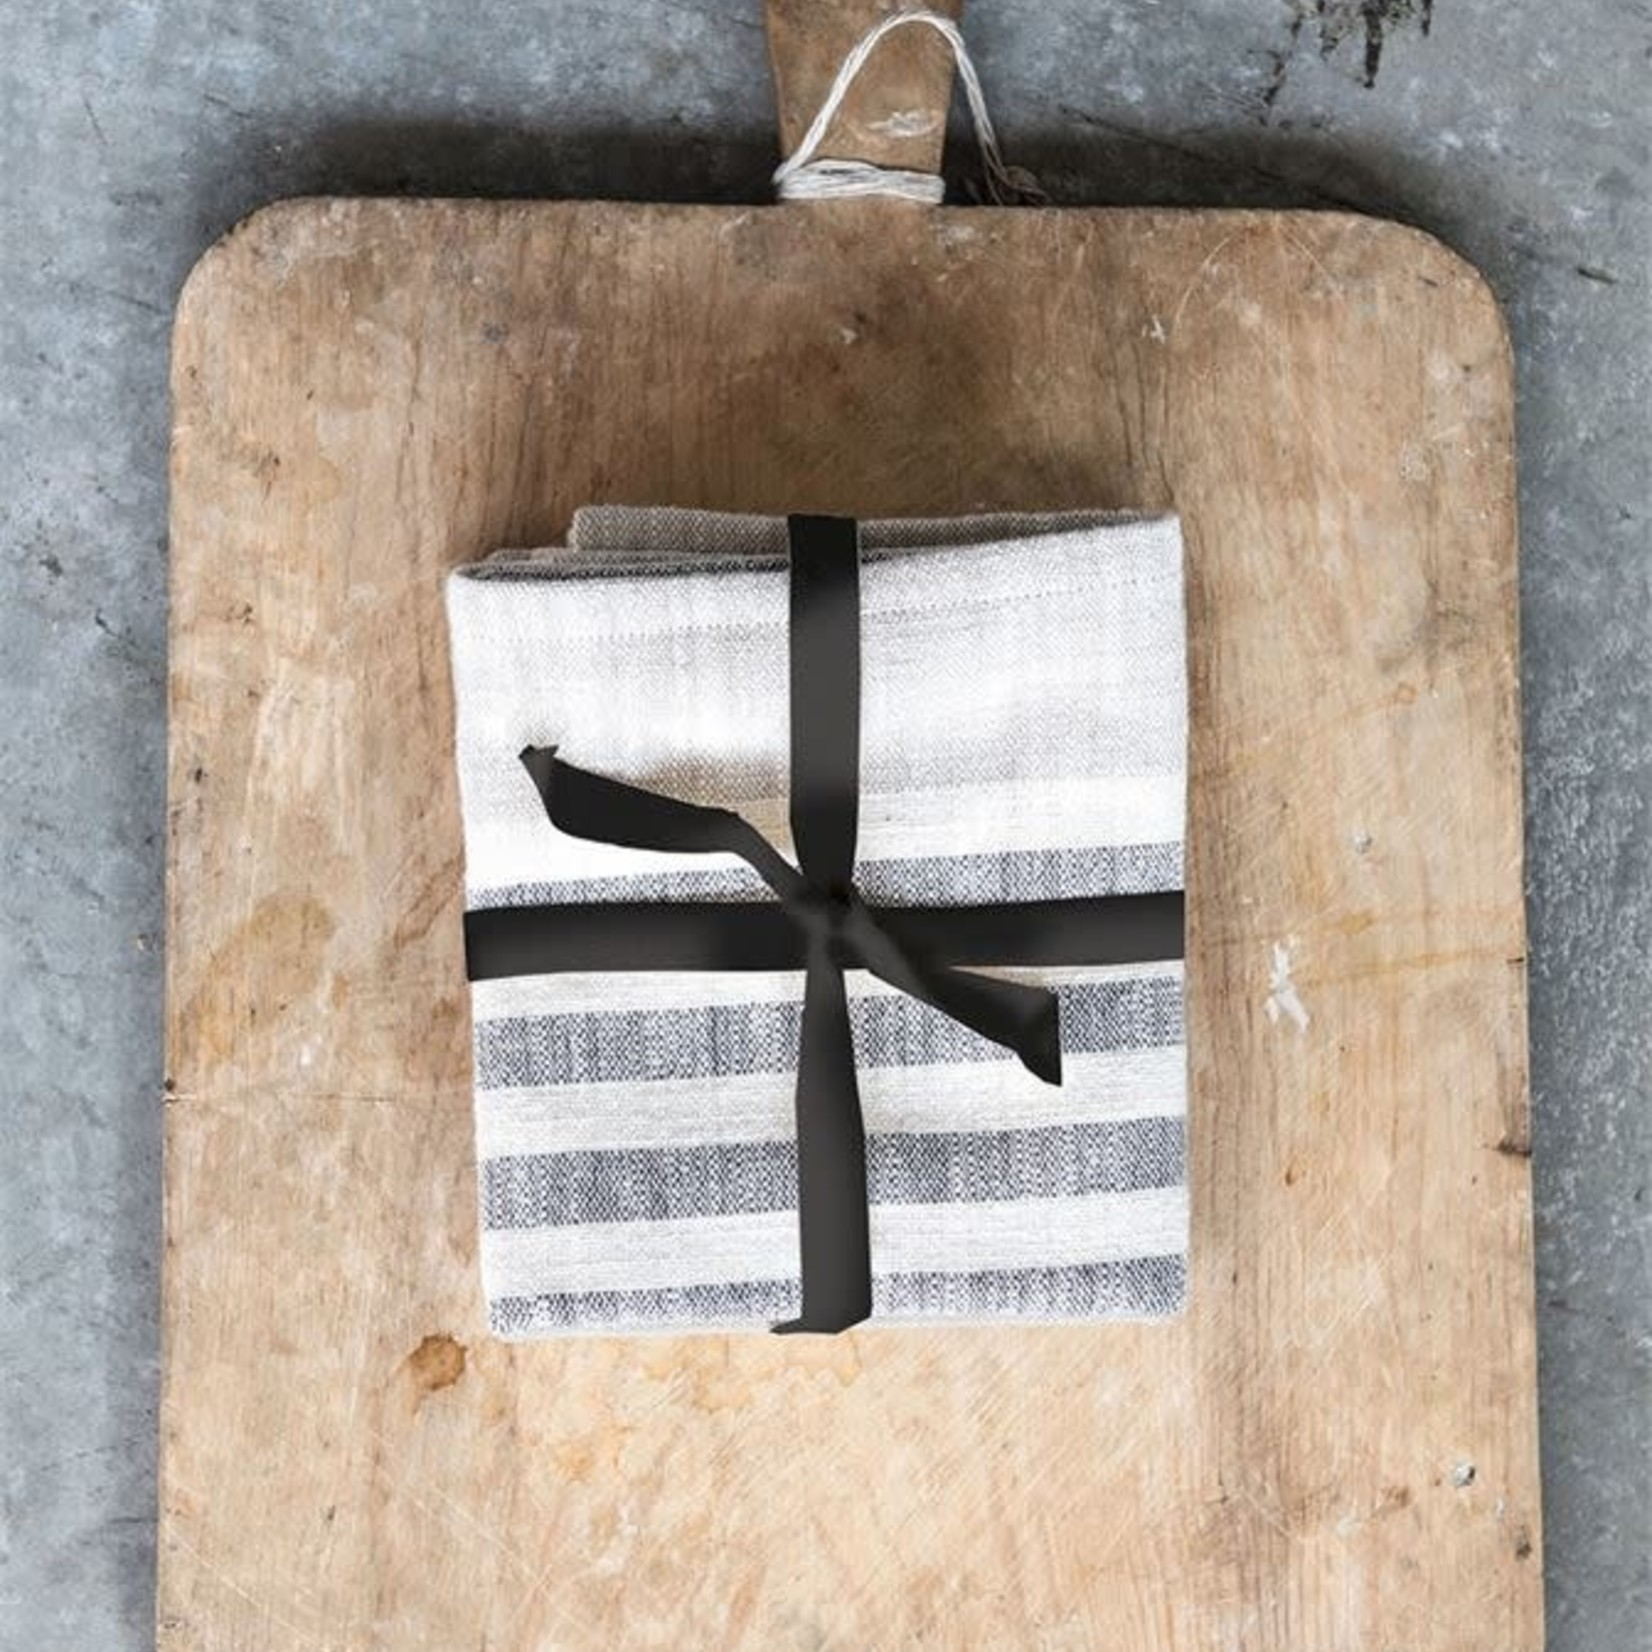 Woven Cotton Striped Tea Towels Set of 3